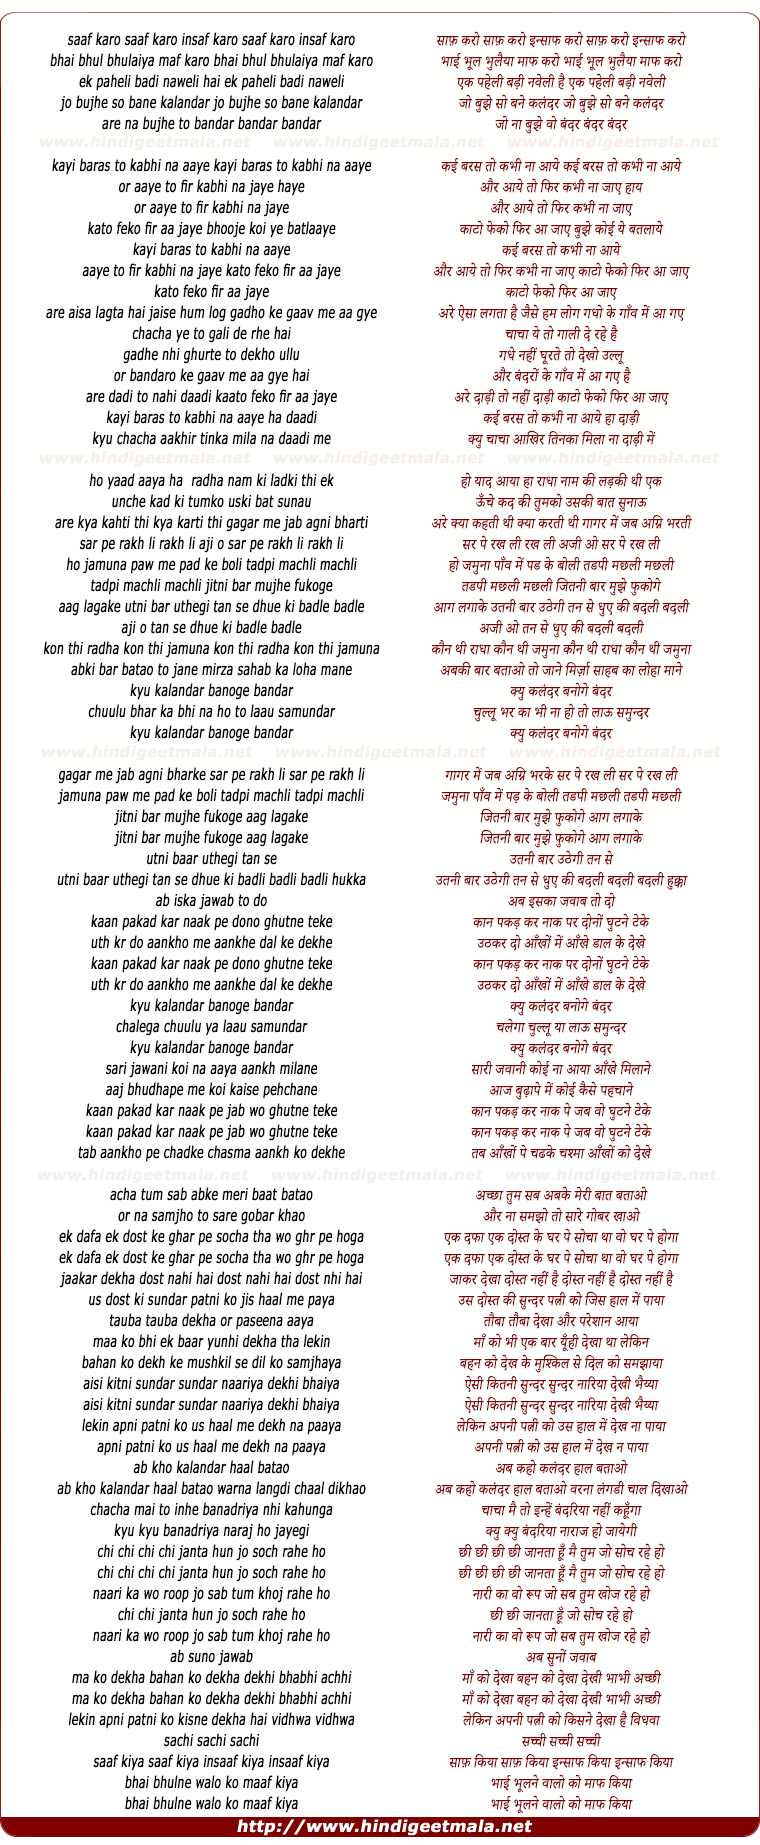 lyrics of song Saaf Karo Insaaf Karo